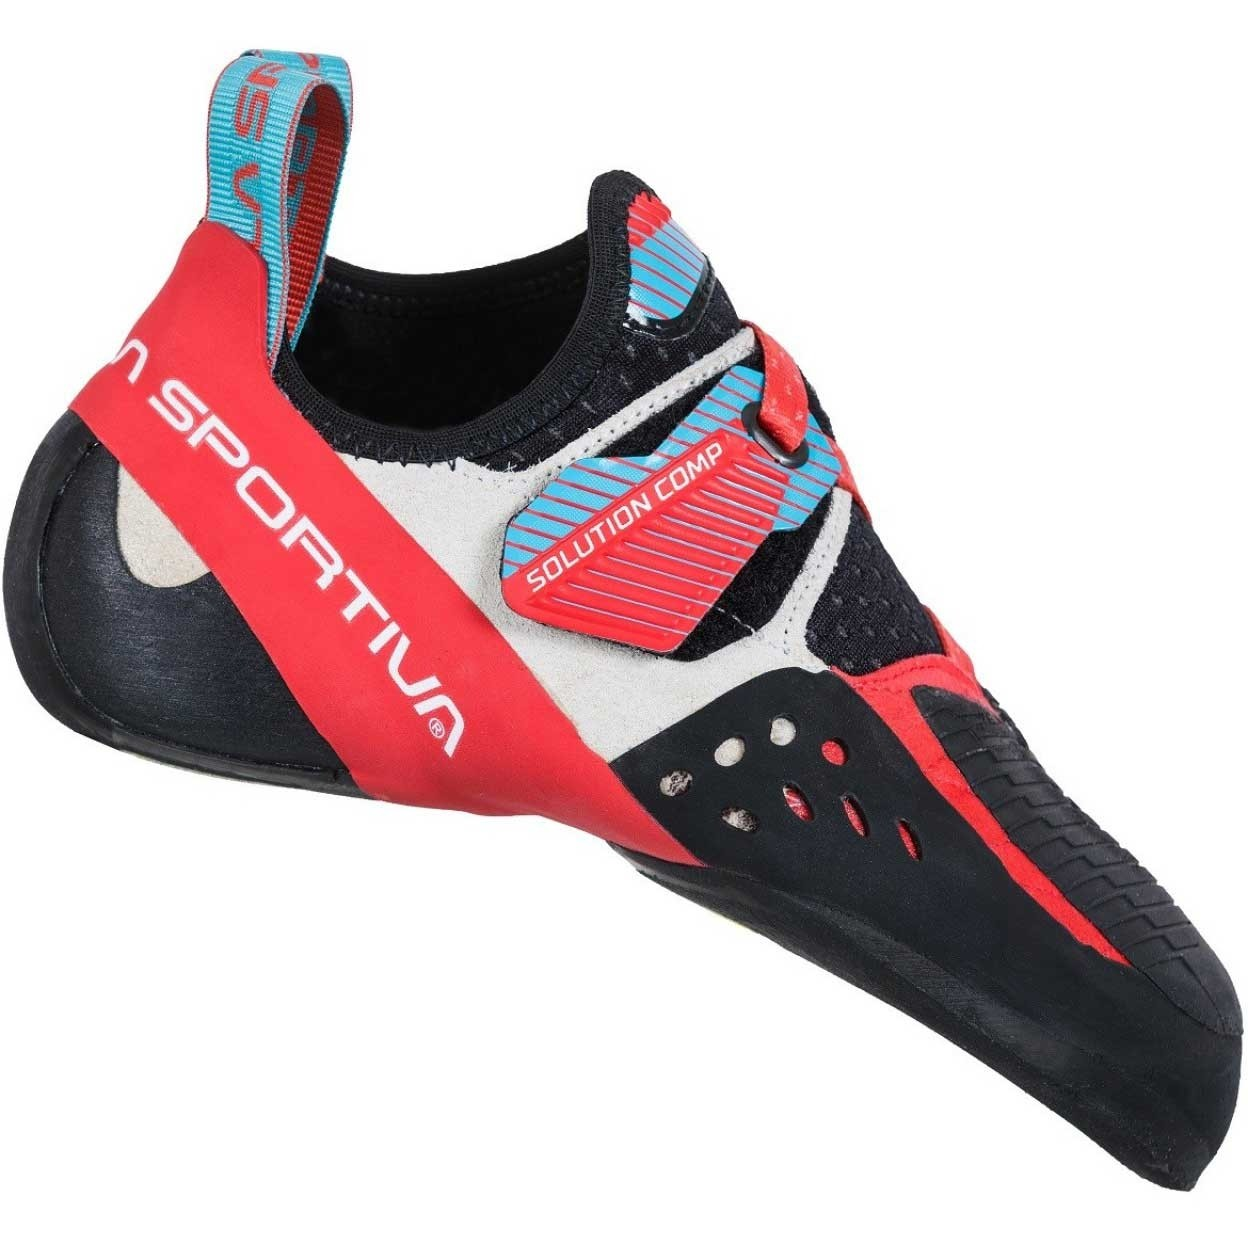 La Sportiva Solution Comp Climbing Shoe - Women's - Hibiscus/Malibu Blue